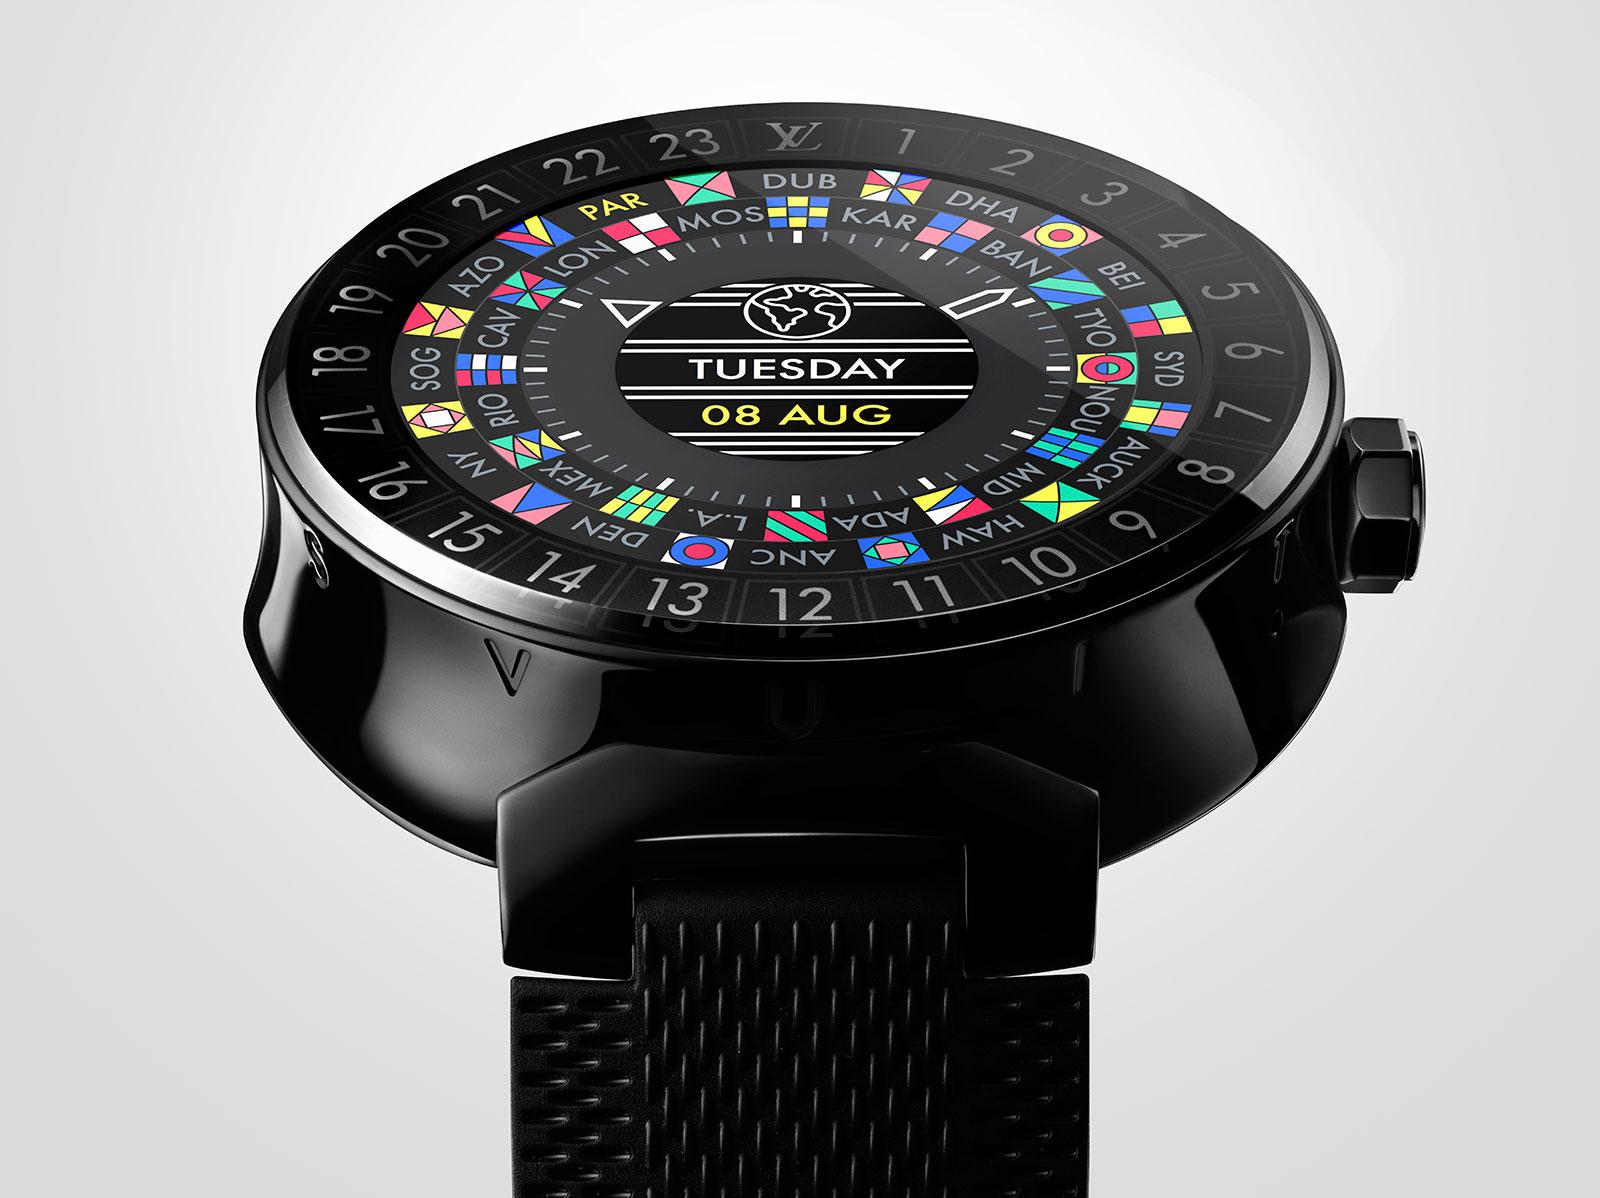 Louis Vuitton To Debut The Tambour Horizon Smartwatch